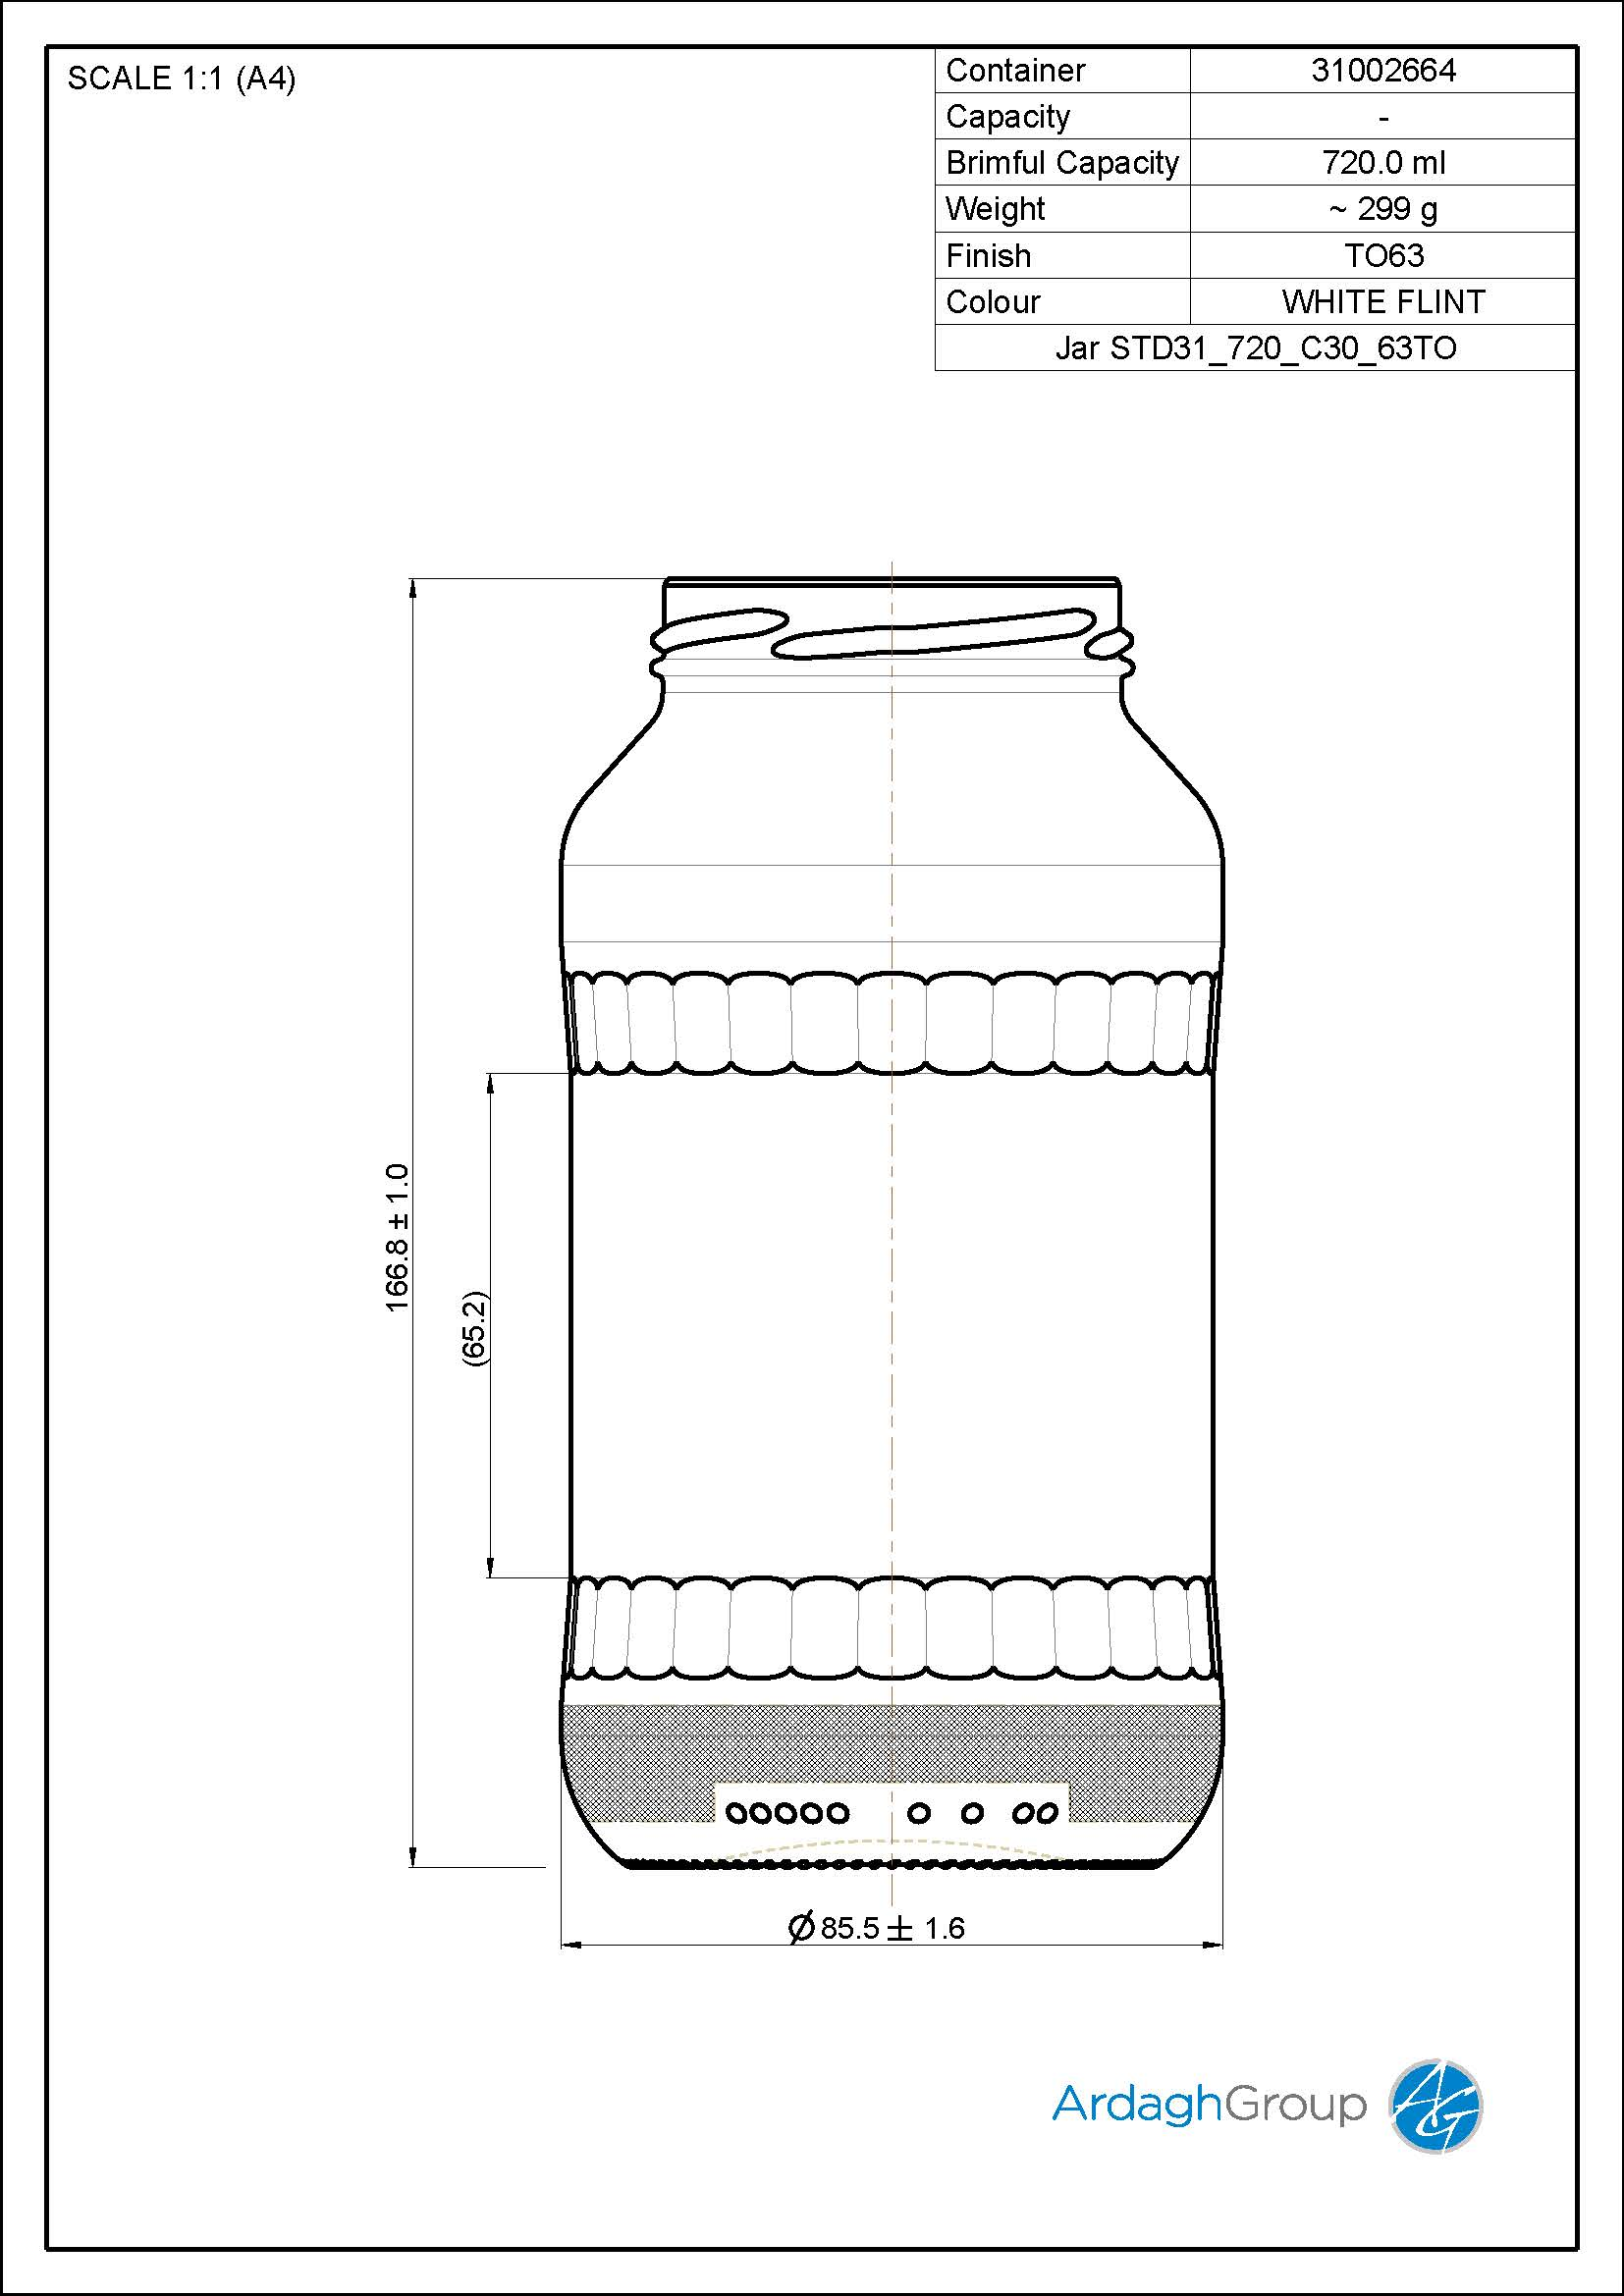 Jar STD31 720 C30 63TO